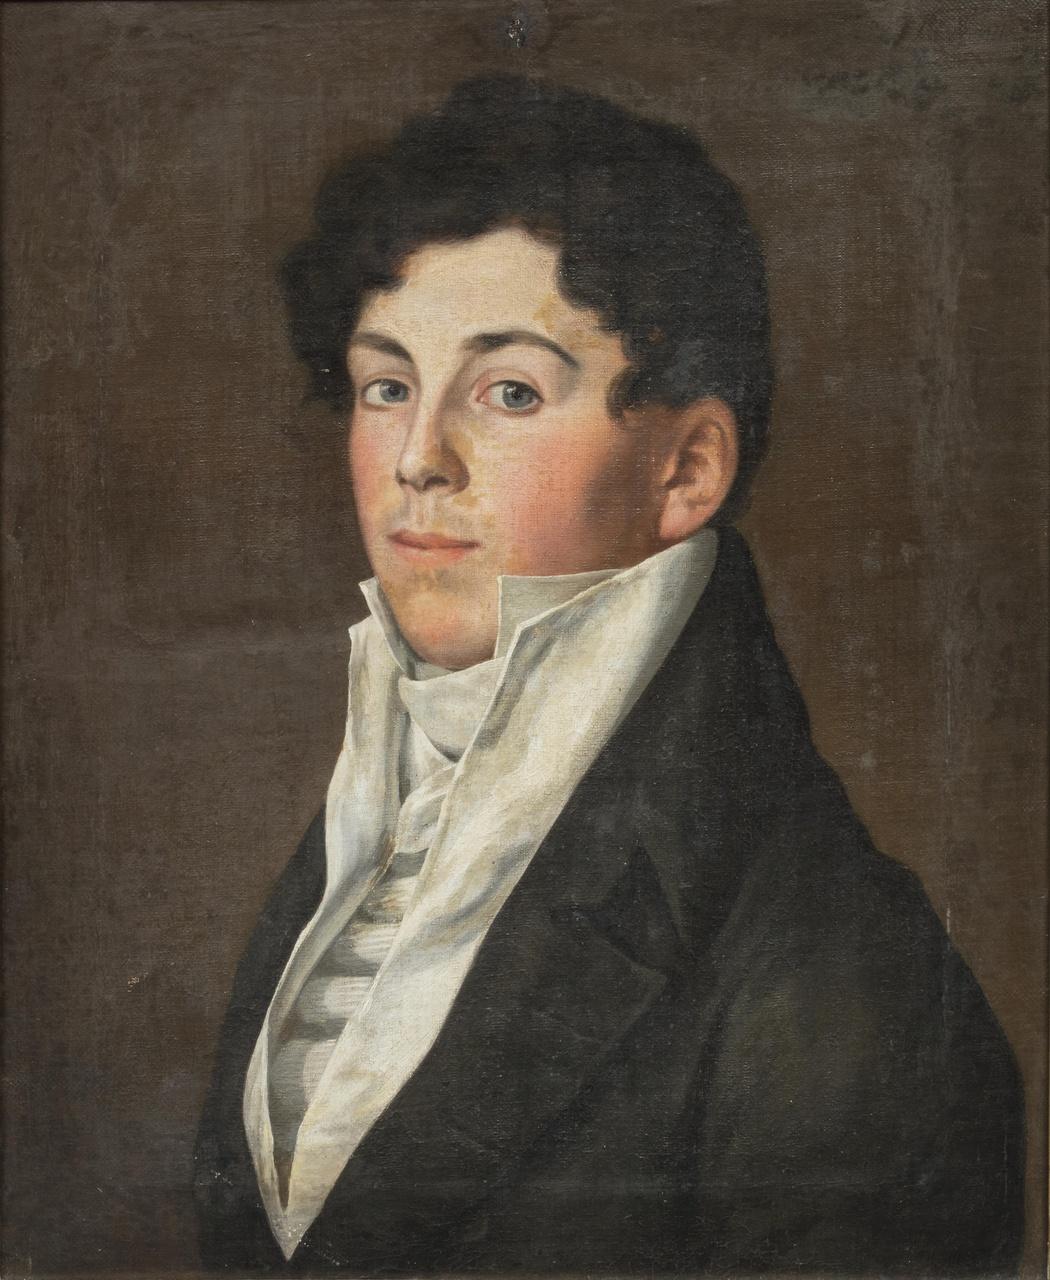 Portret van Balthasar Willem Theodorus Falck (1793-1839)